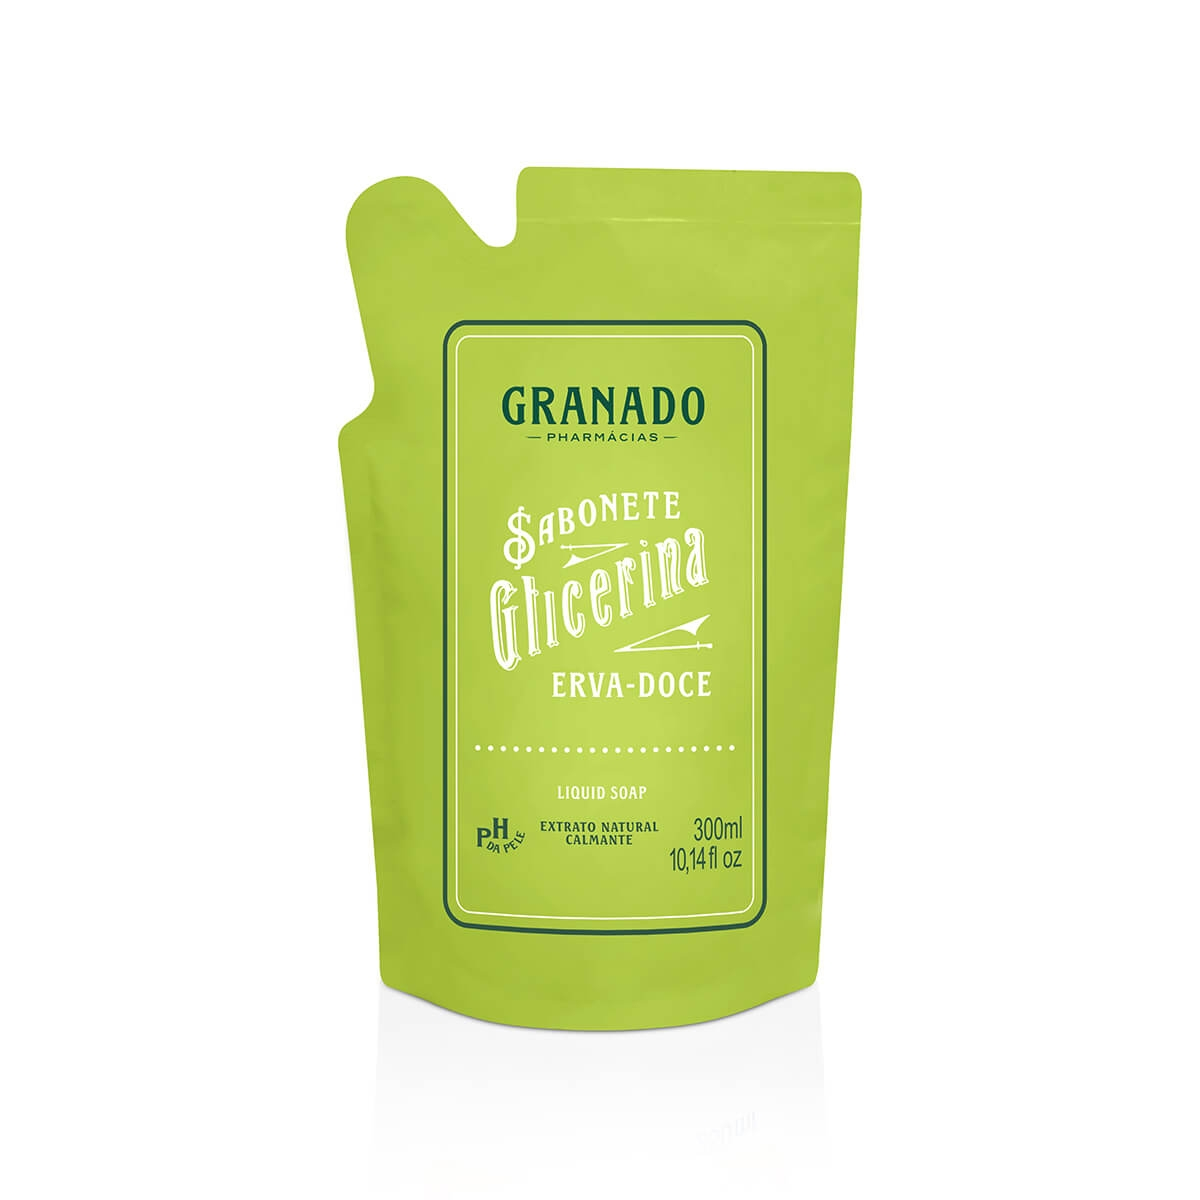 Refil Sabonete Líquido Glicerina Granado Erva Doce 300ml